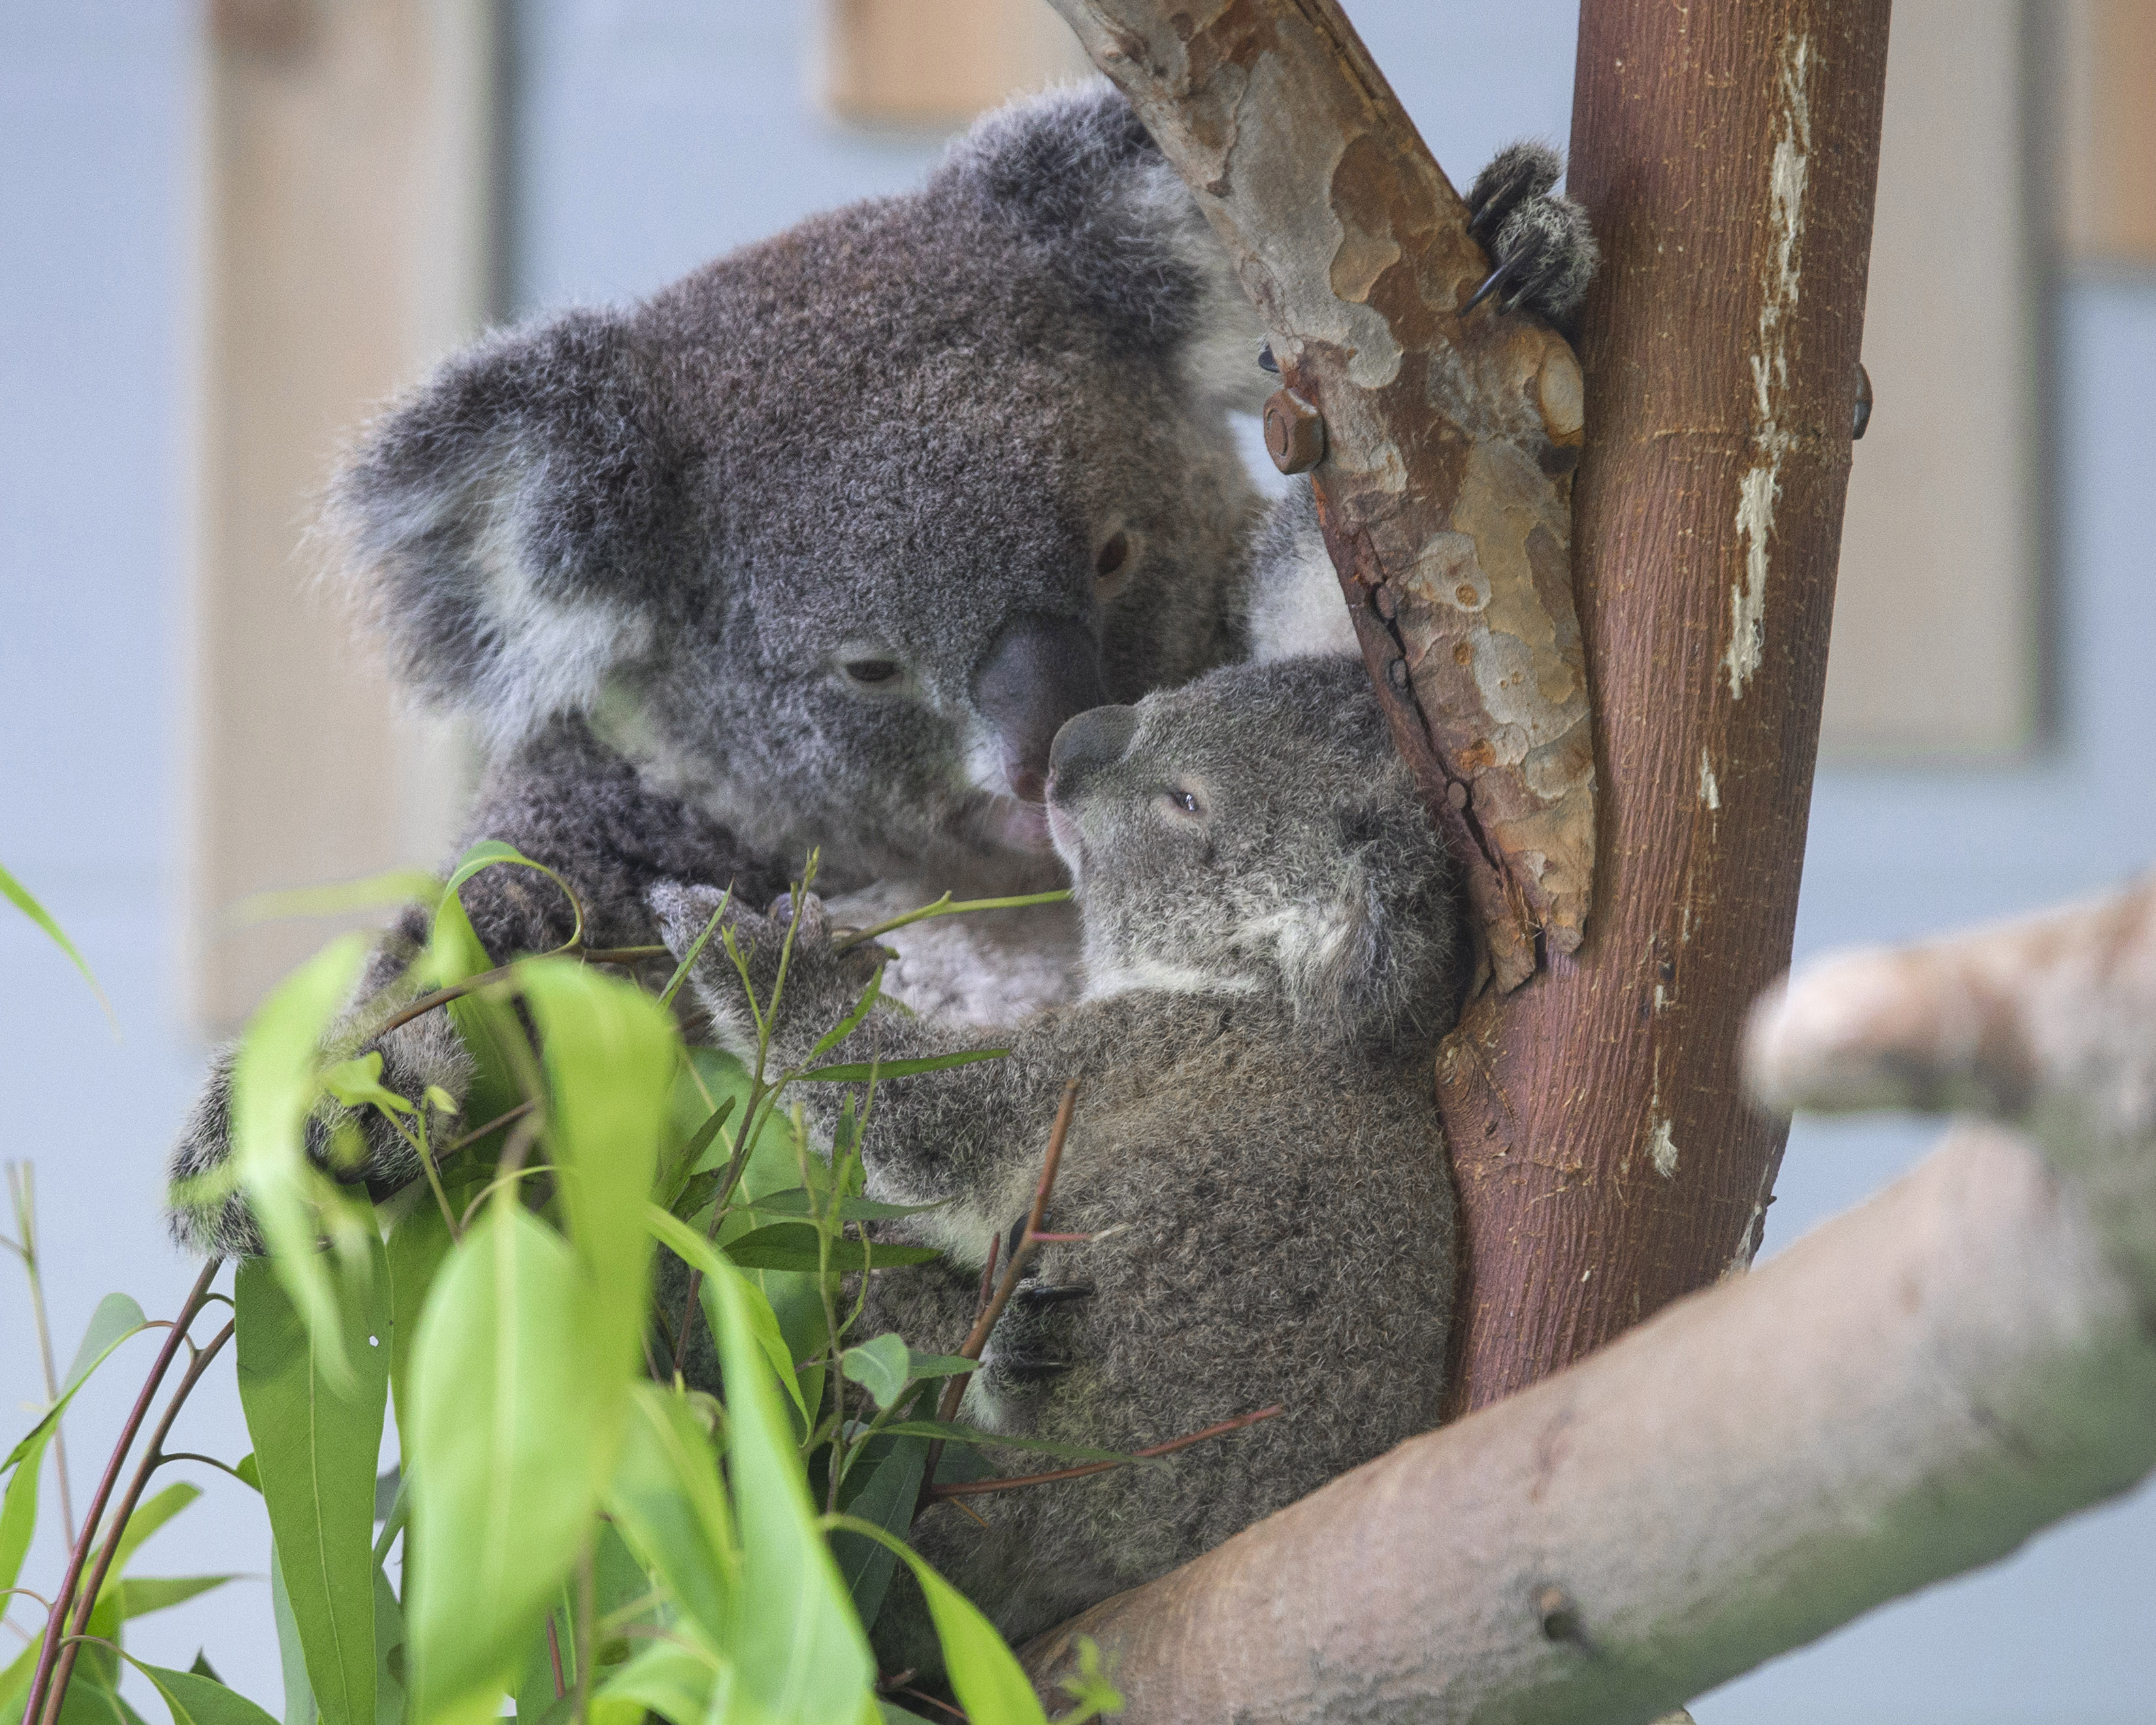 Newborn koala meet visitors in Nanjing